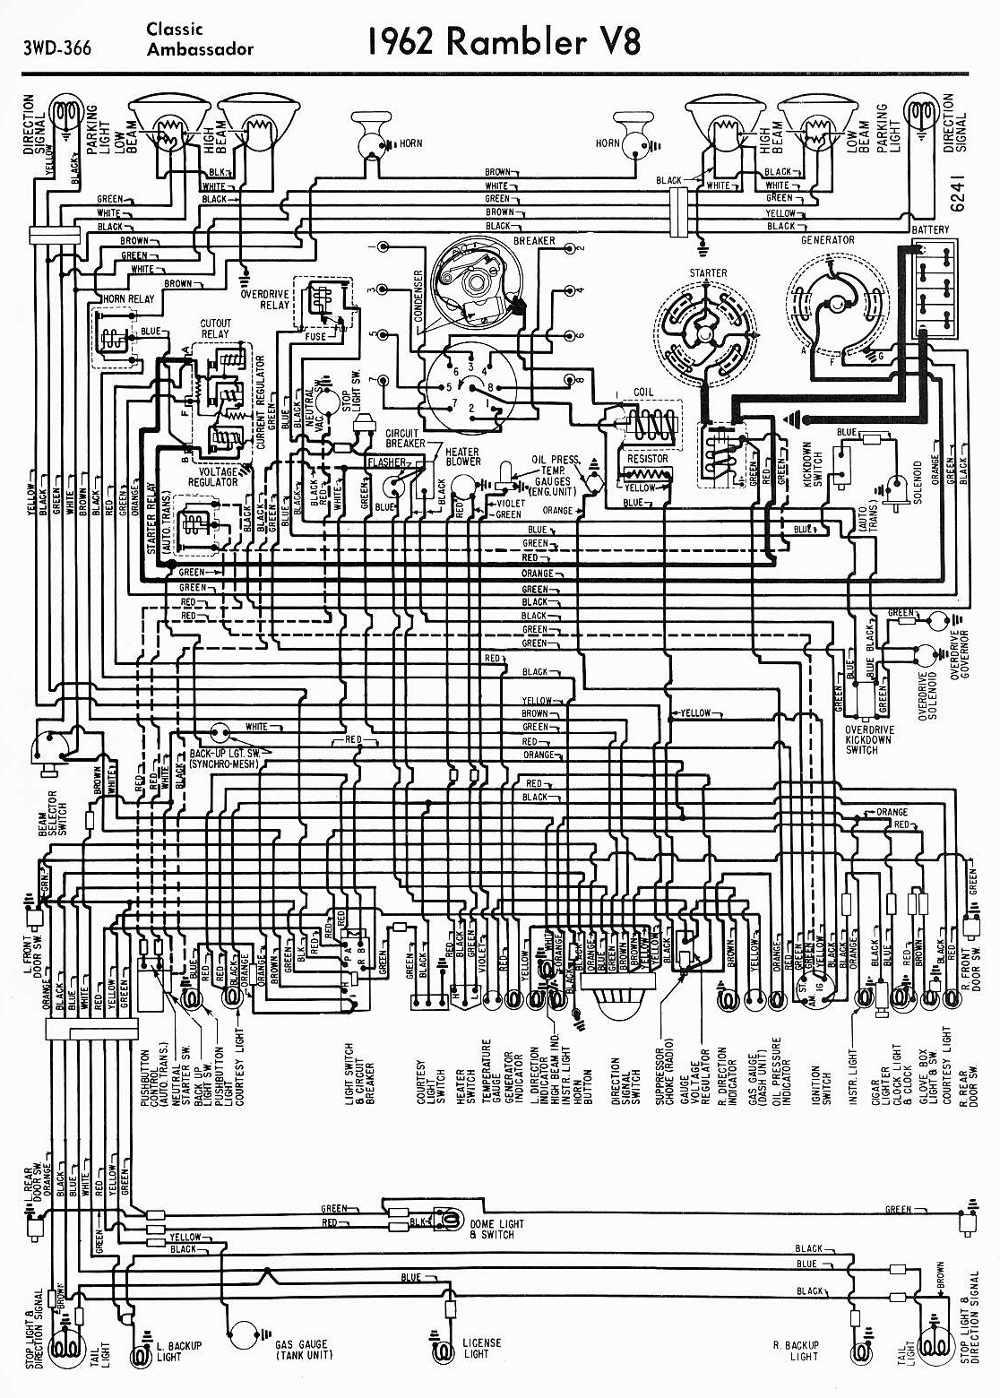 hight resolution of amc car manuals wiring diagrams pdf fault codes 1973 amc ambassador 1973 amc wiring diagram